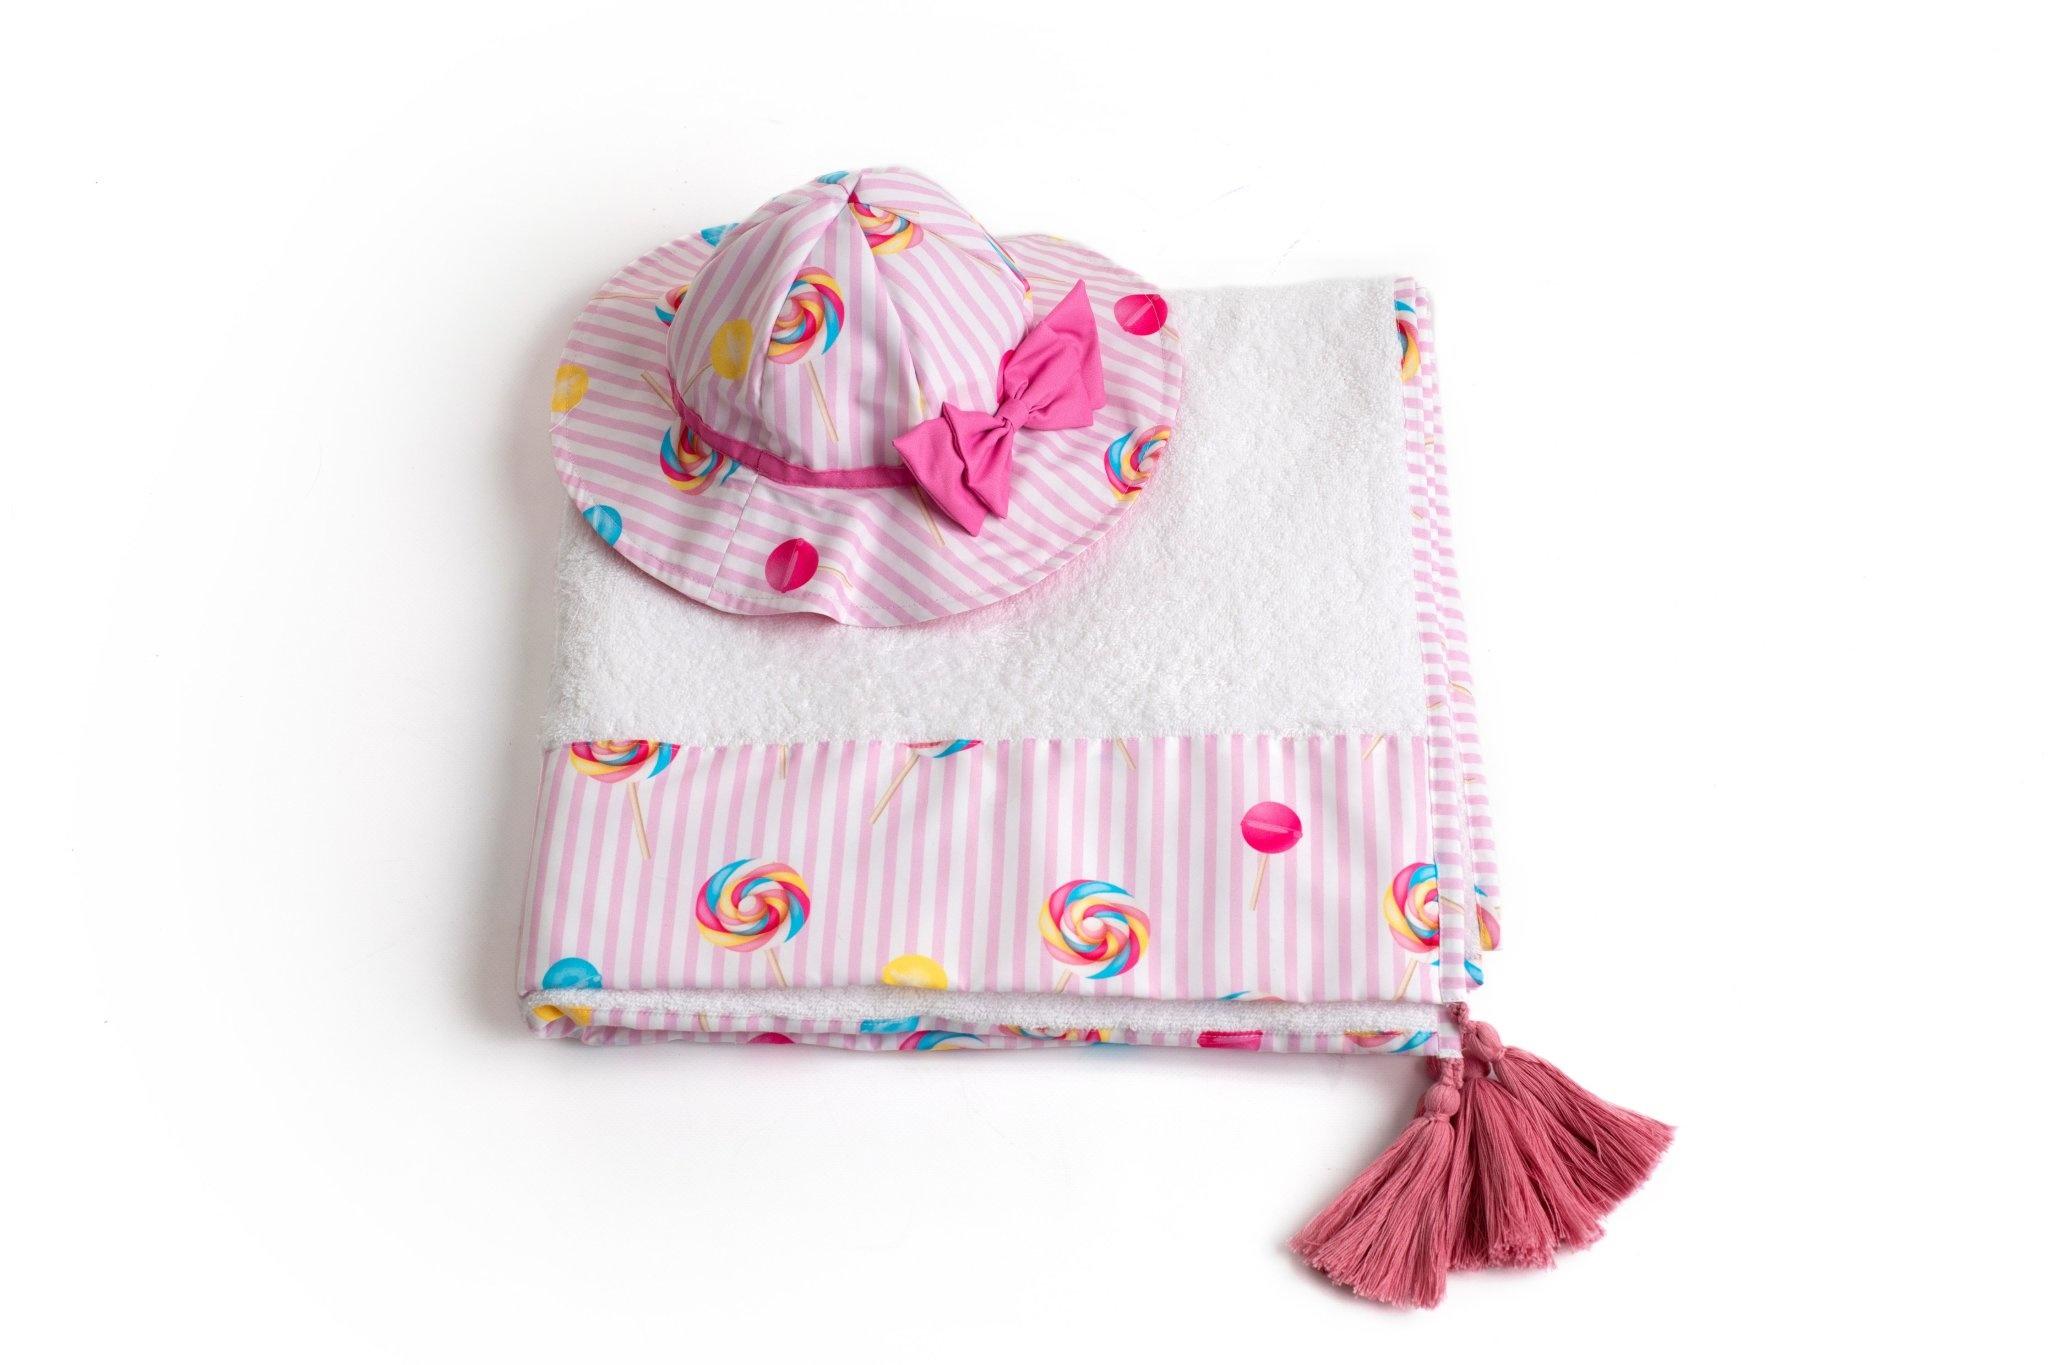 Meia Pata Meia Pata Girls Lollipop Sun Hat S21